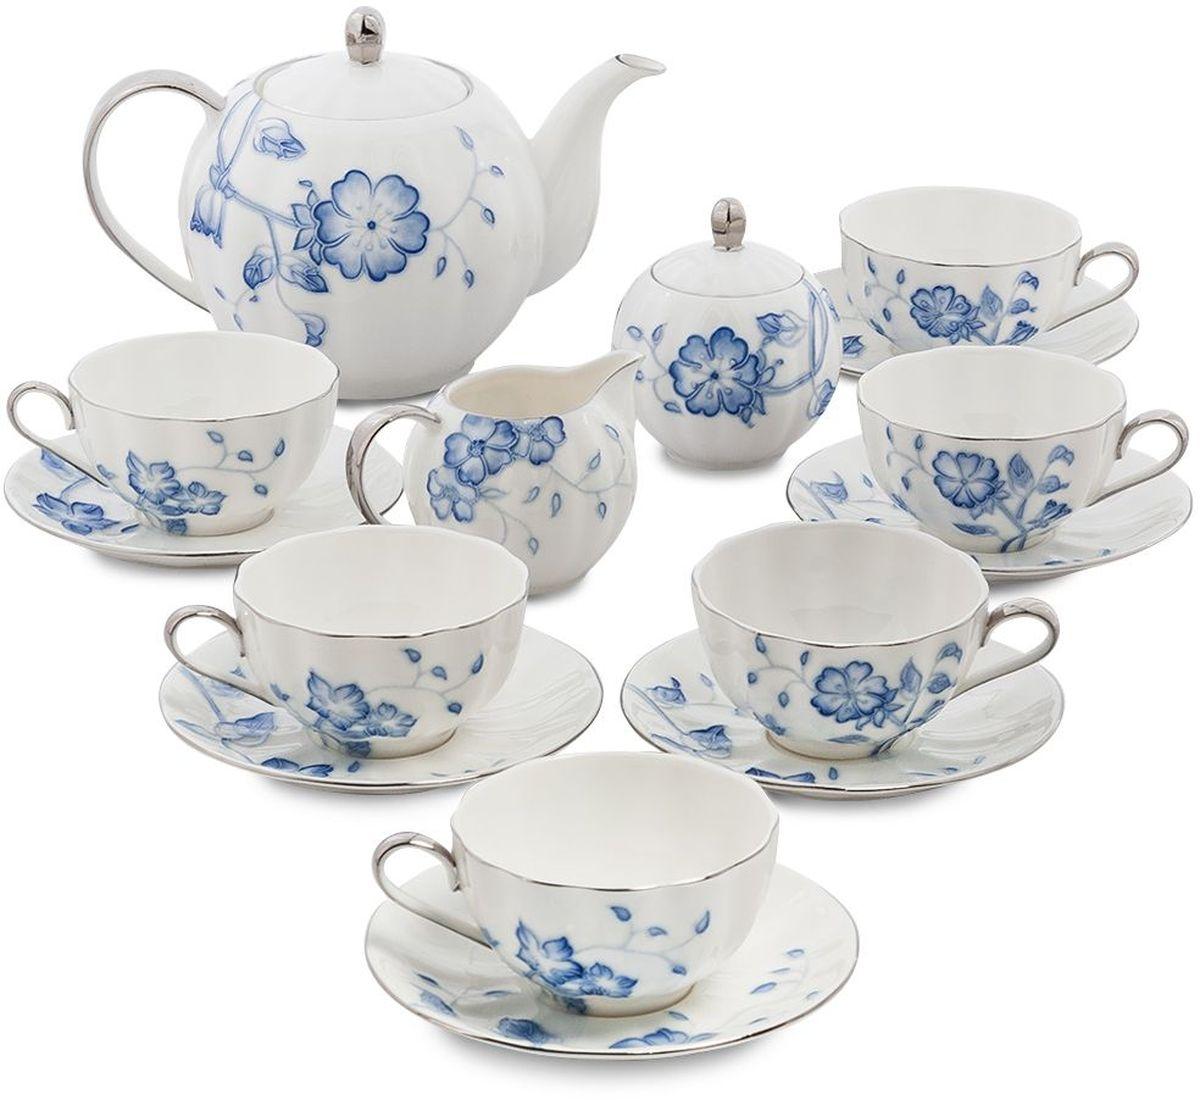 Сервиз чайный Pavone Голубая бабочка, 15 предметов. 451601451601Объем чайника: 1 л Объем сахарницы: 200 мл Объем молочника: 200 мл Объем чашки: 200 мл Диаметр блюдца: 14 см.